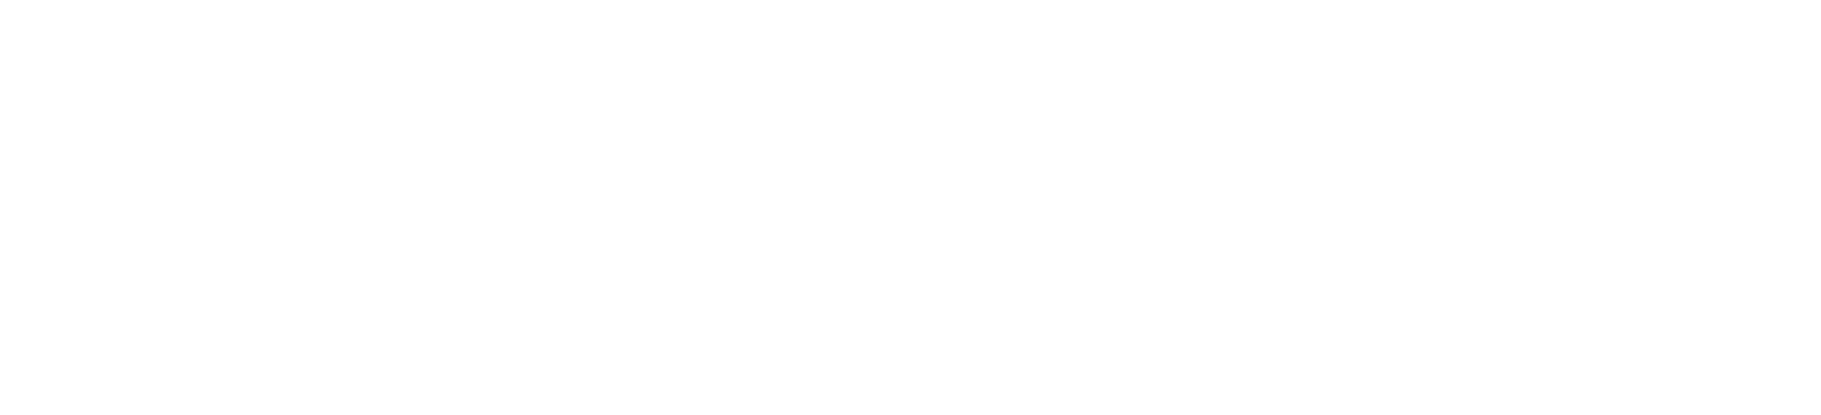 Playhaven